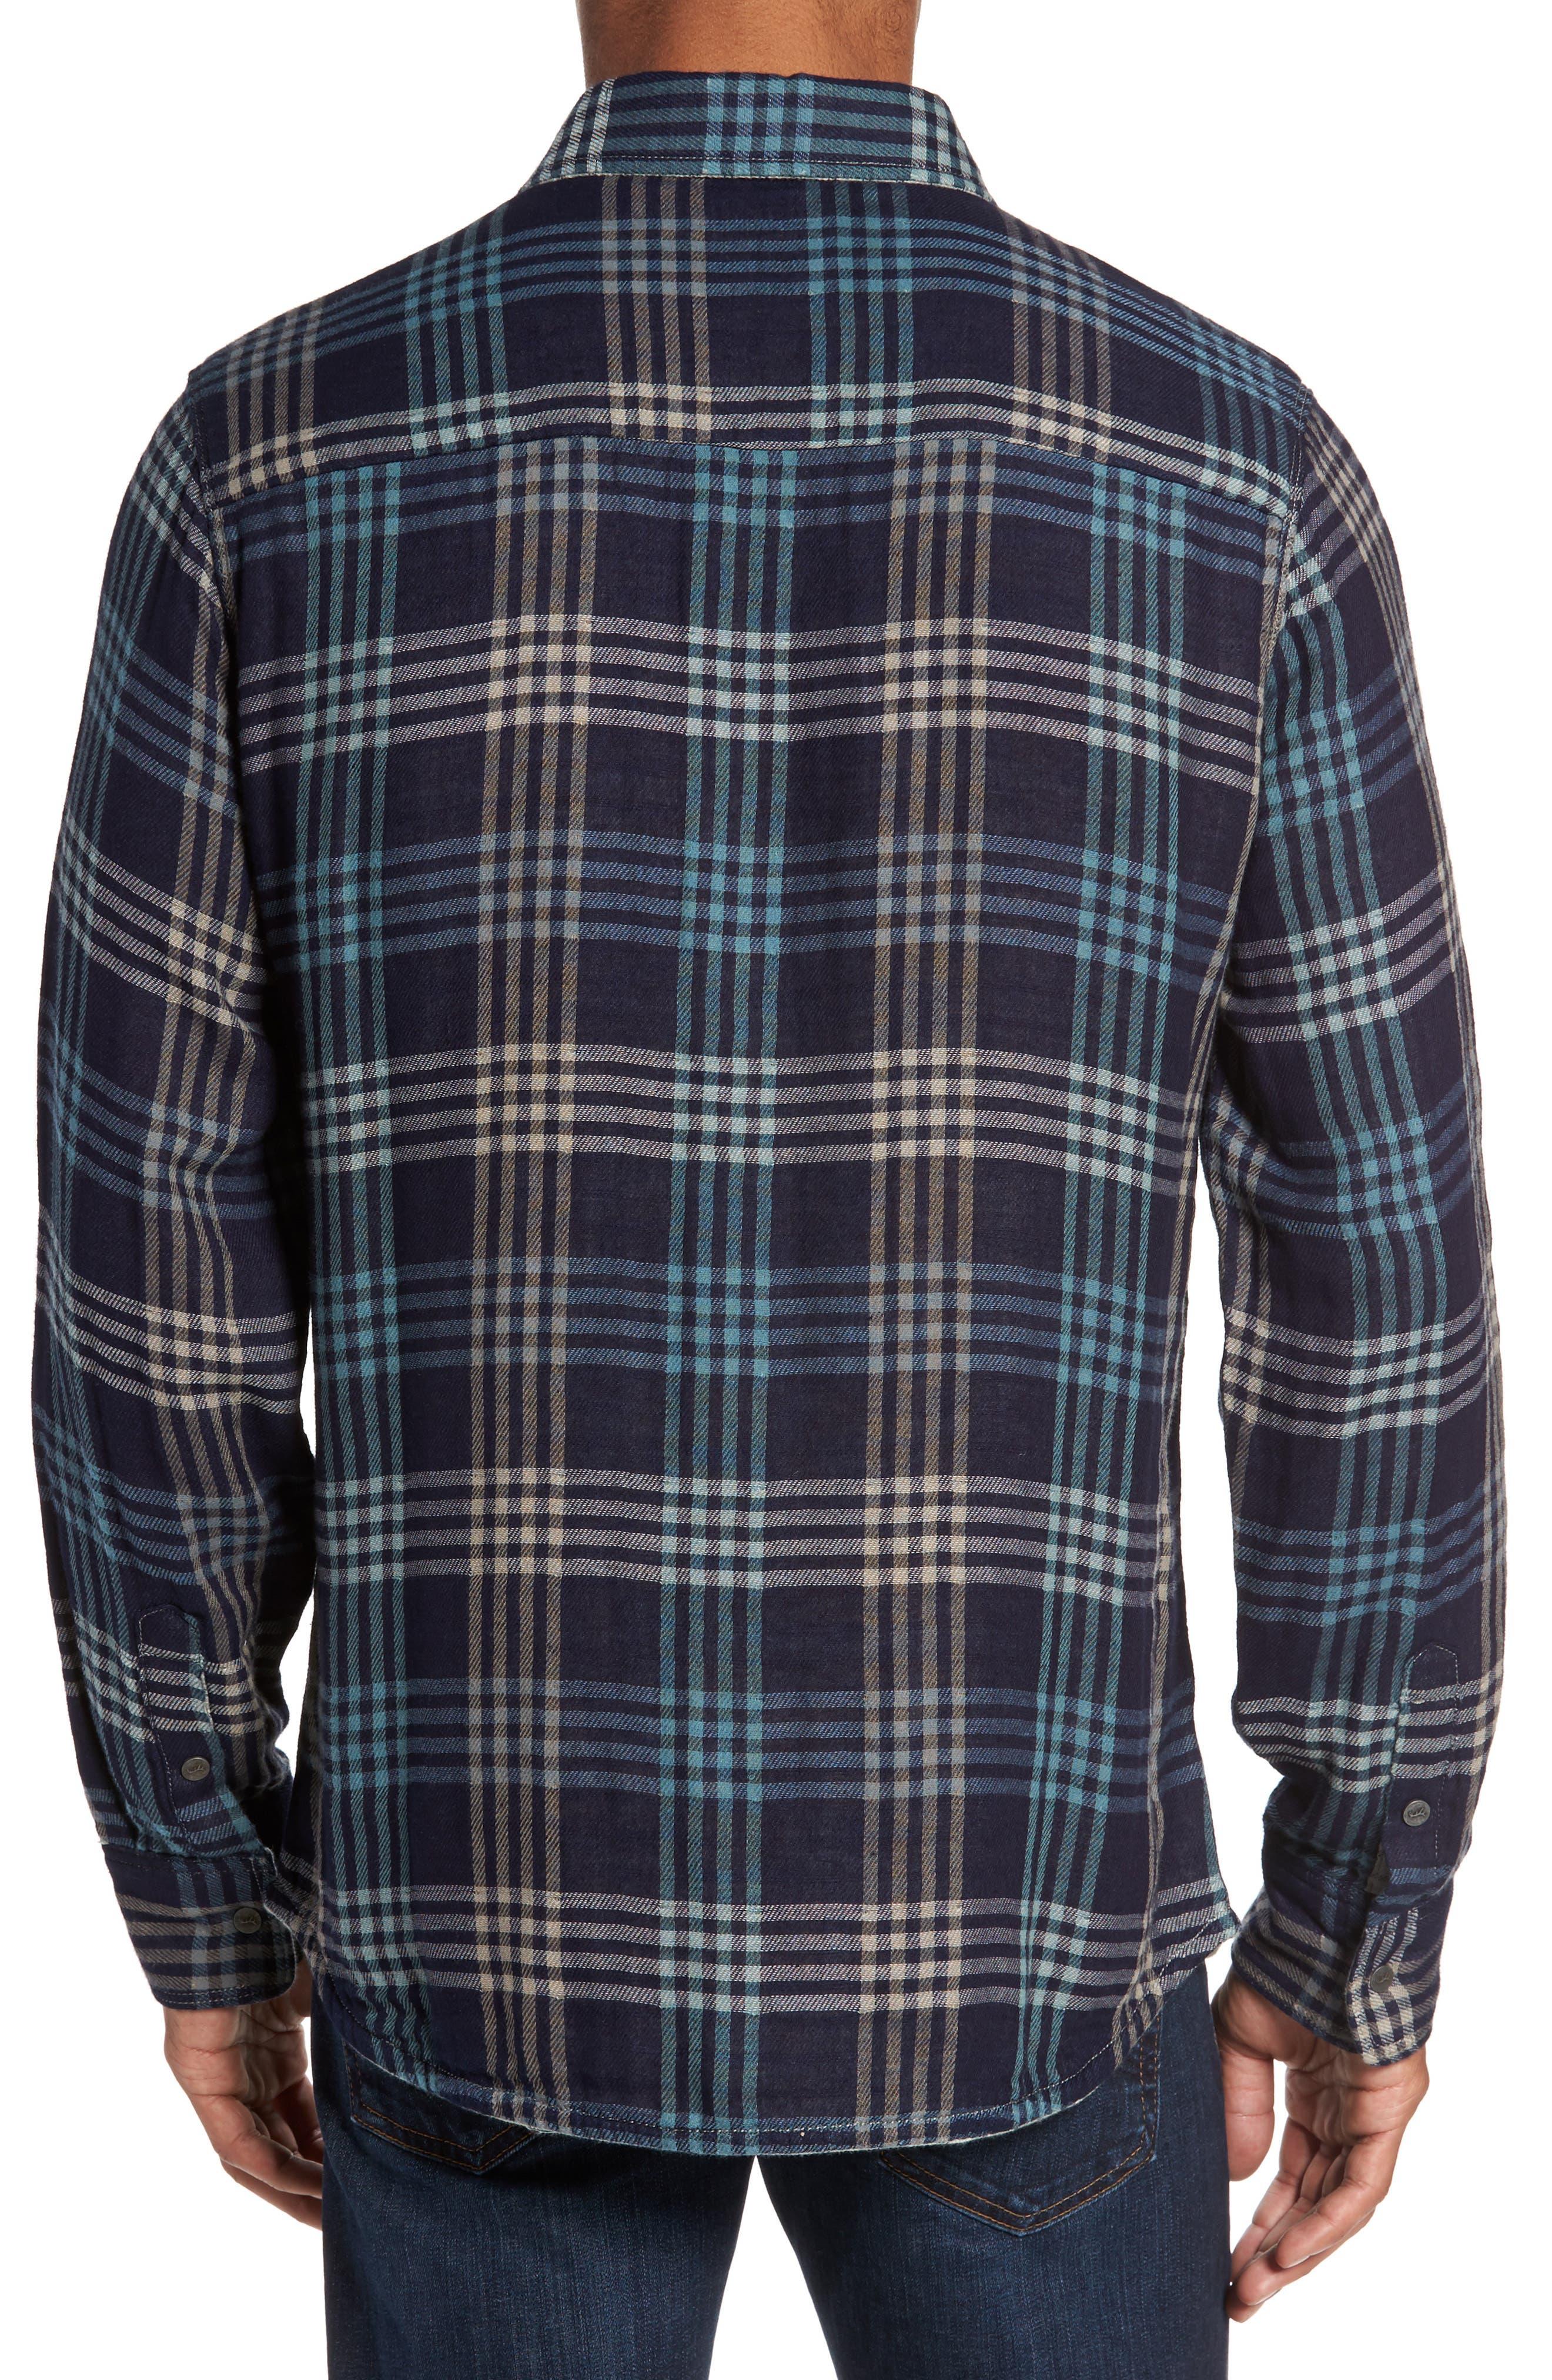 Cypress Reversible Twill Shirt,                             Alternate thumbnail 3, color,